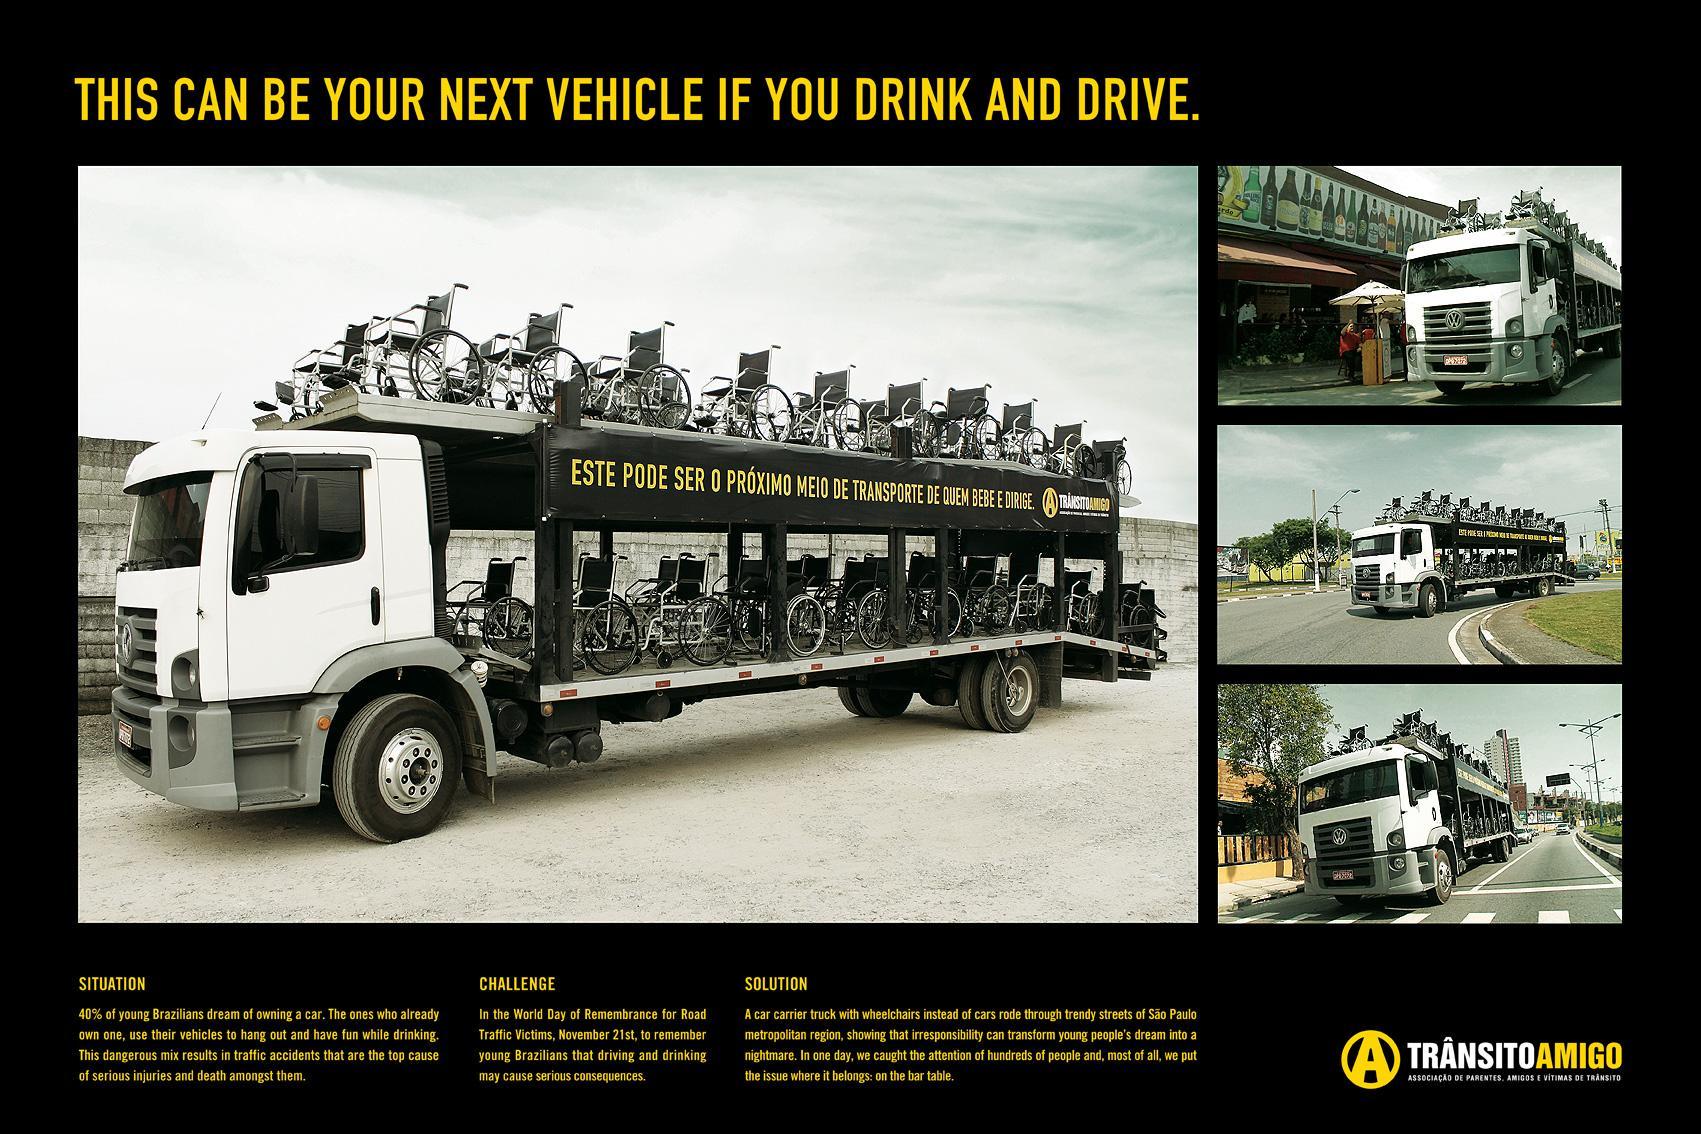 Trânsito Amigo Ambient Ad -  Car carrier truck